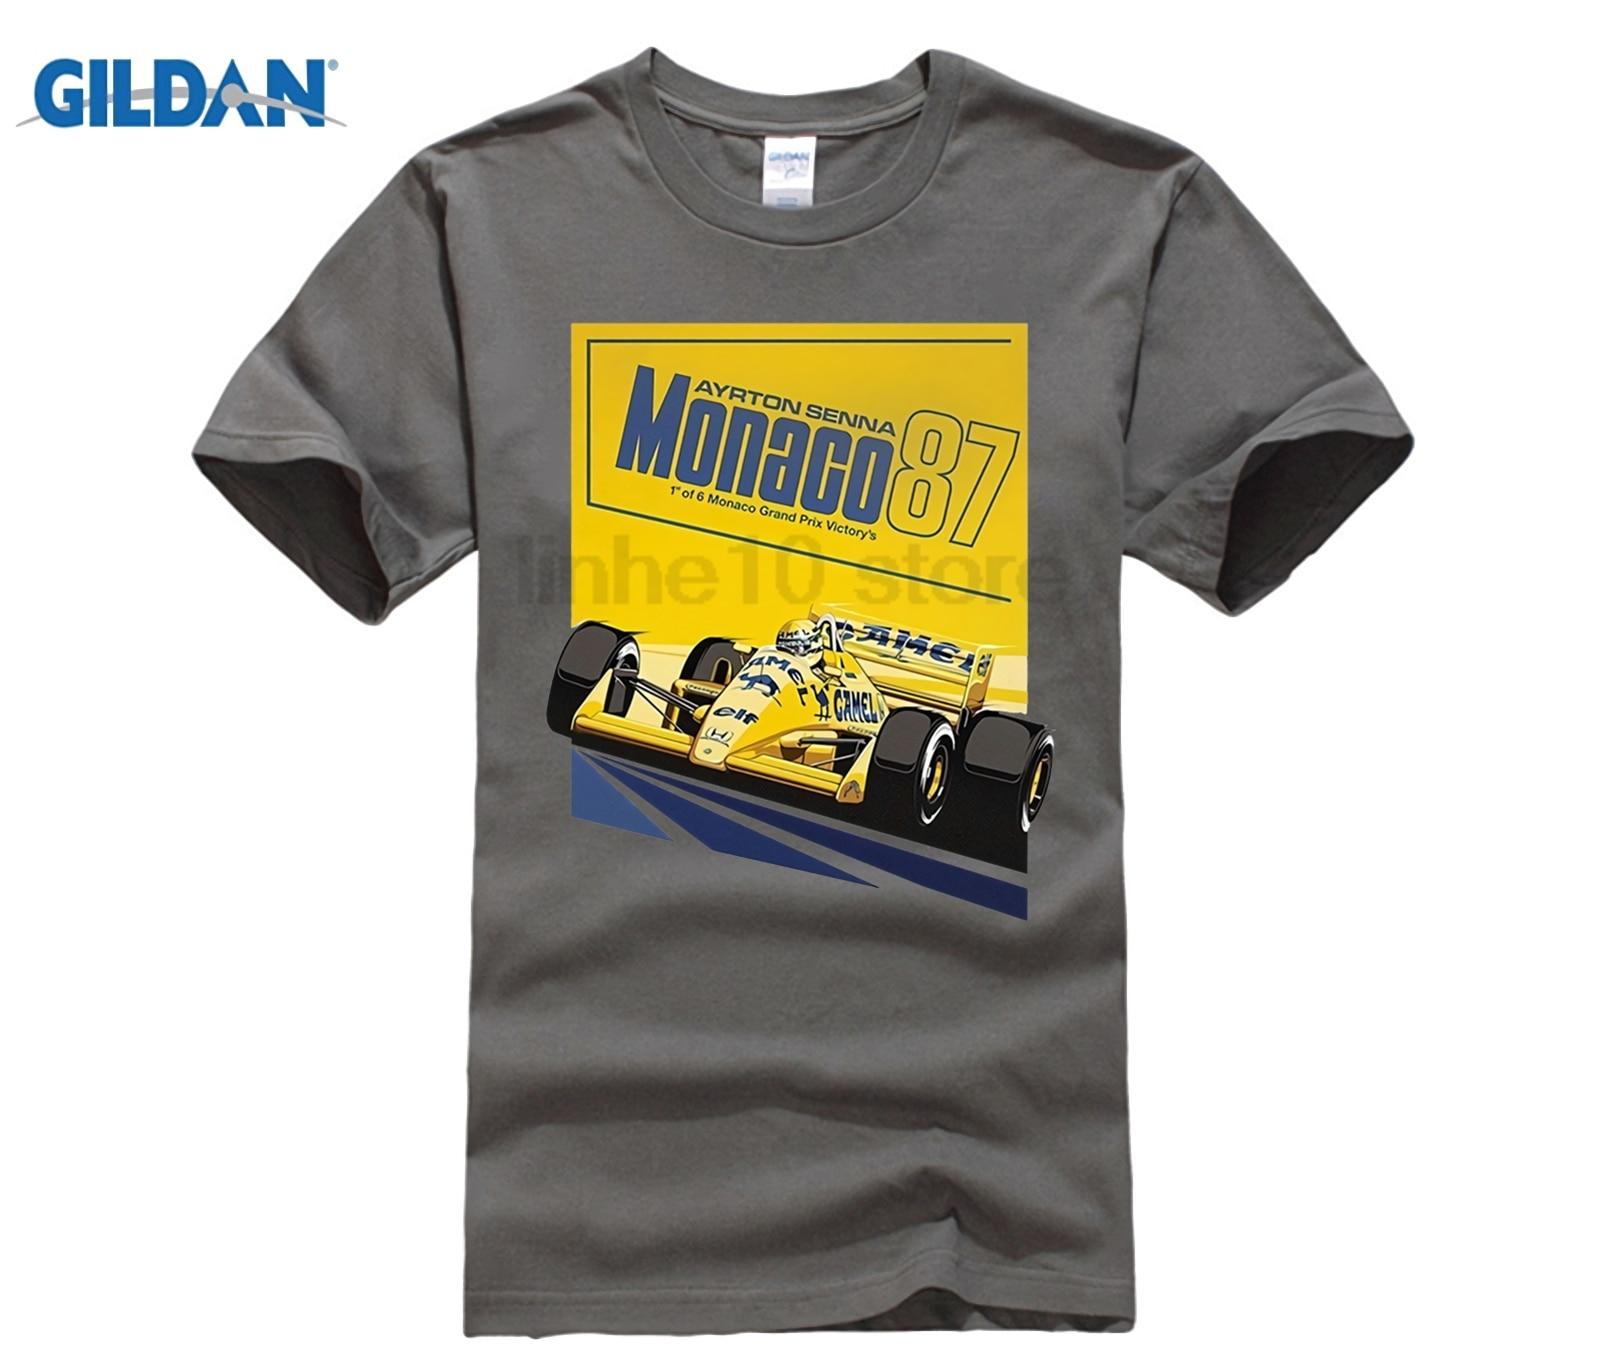 new-arrival-ayrton-font-b-senna-b-font-87-poster-tops-t-shirt-1-car-men-round-collar-short-sleeve-t-shirts